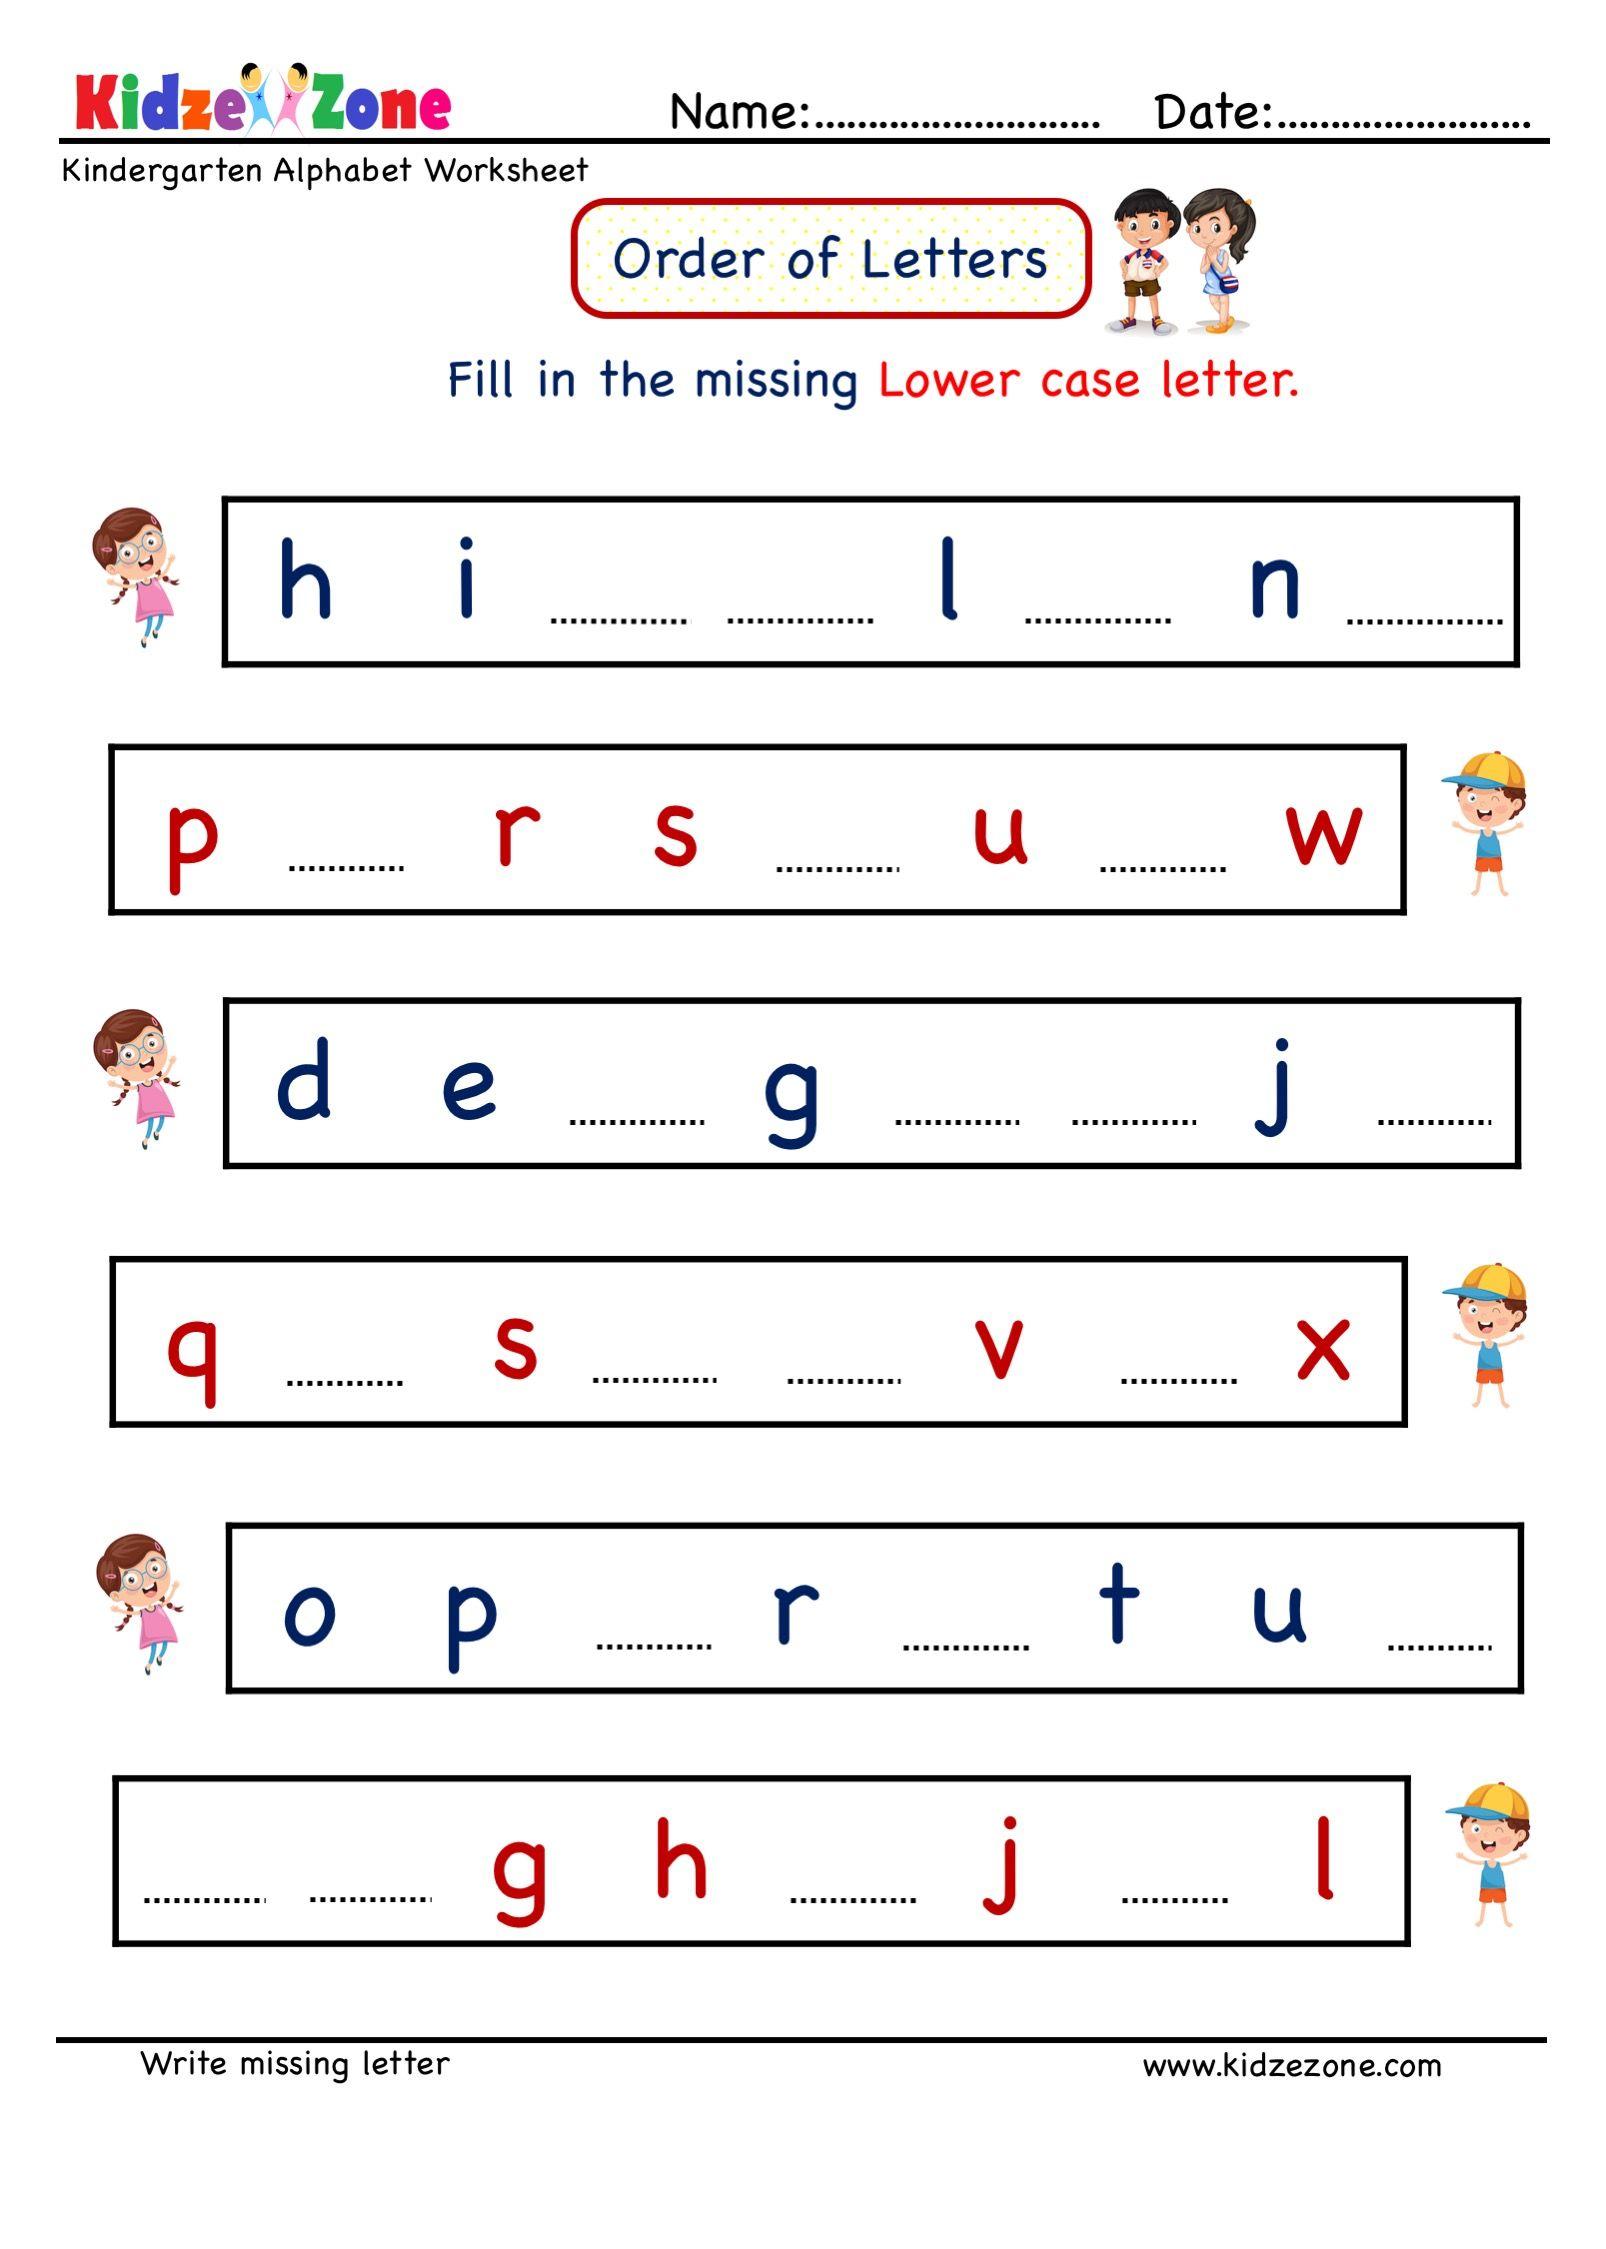 Kindergarten Missing Letter Writing Worksheet In 2021 Letter Worksheets Kindergarten Letter Writing Worksheets Letter Worksheets Write missing letter worksheet